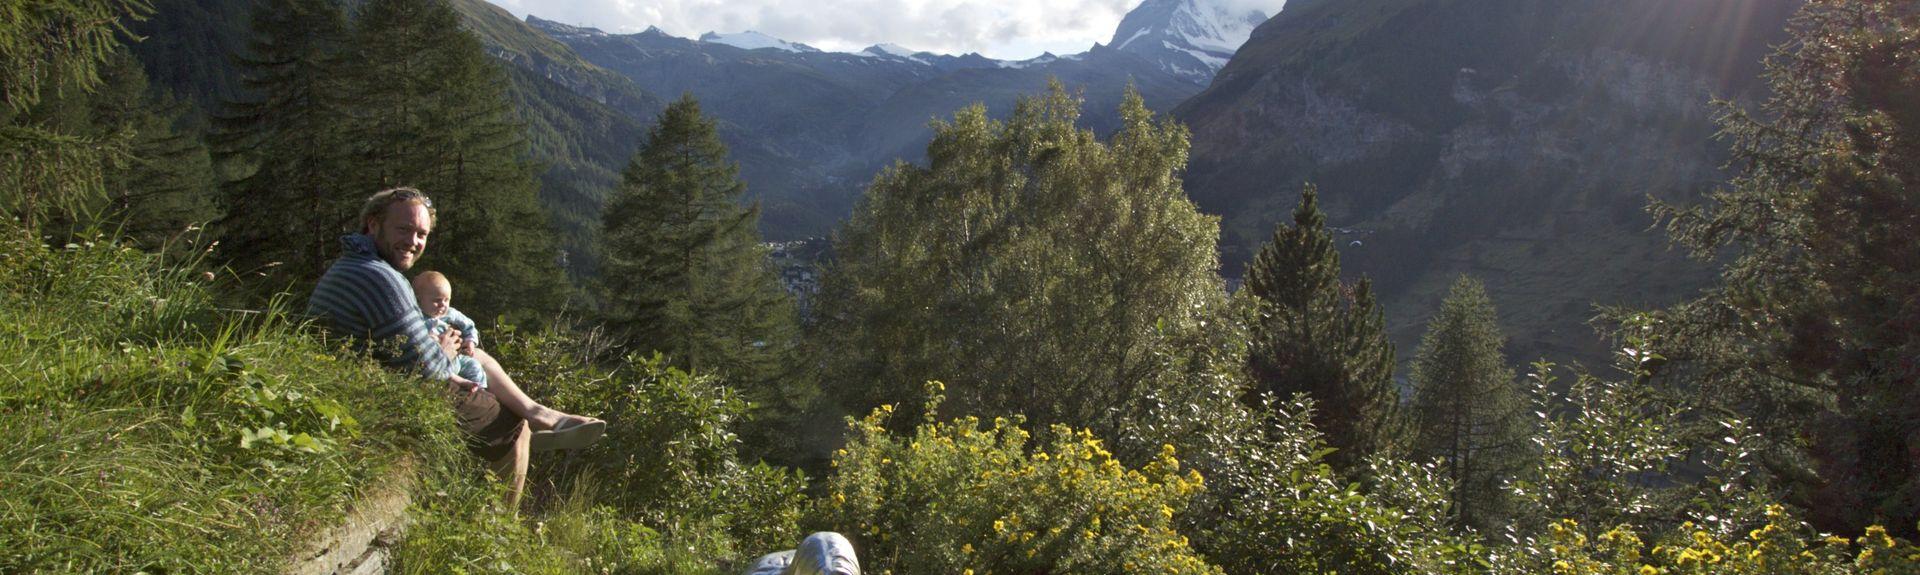 Ayer, Valais, Suisse